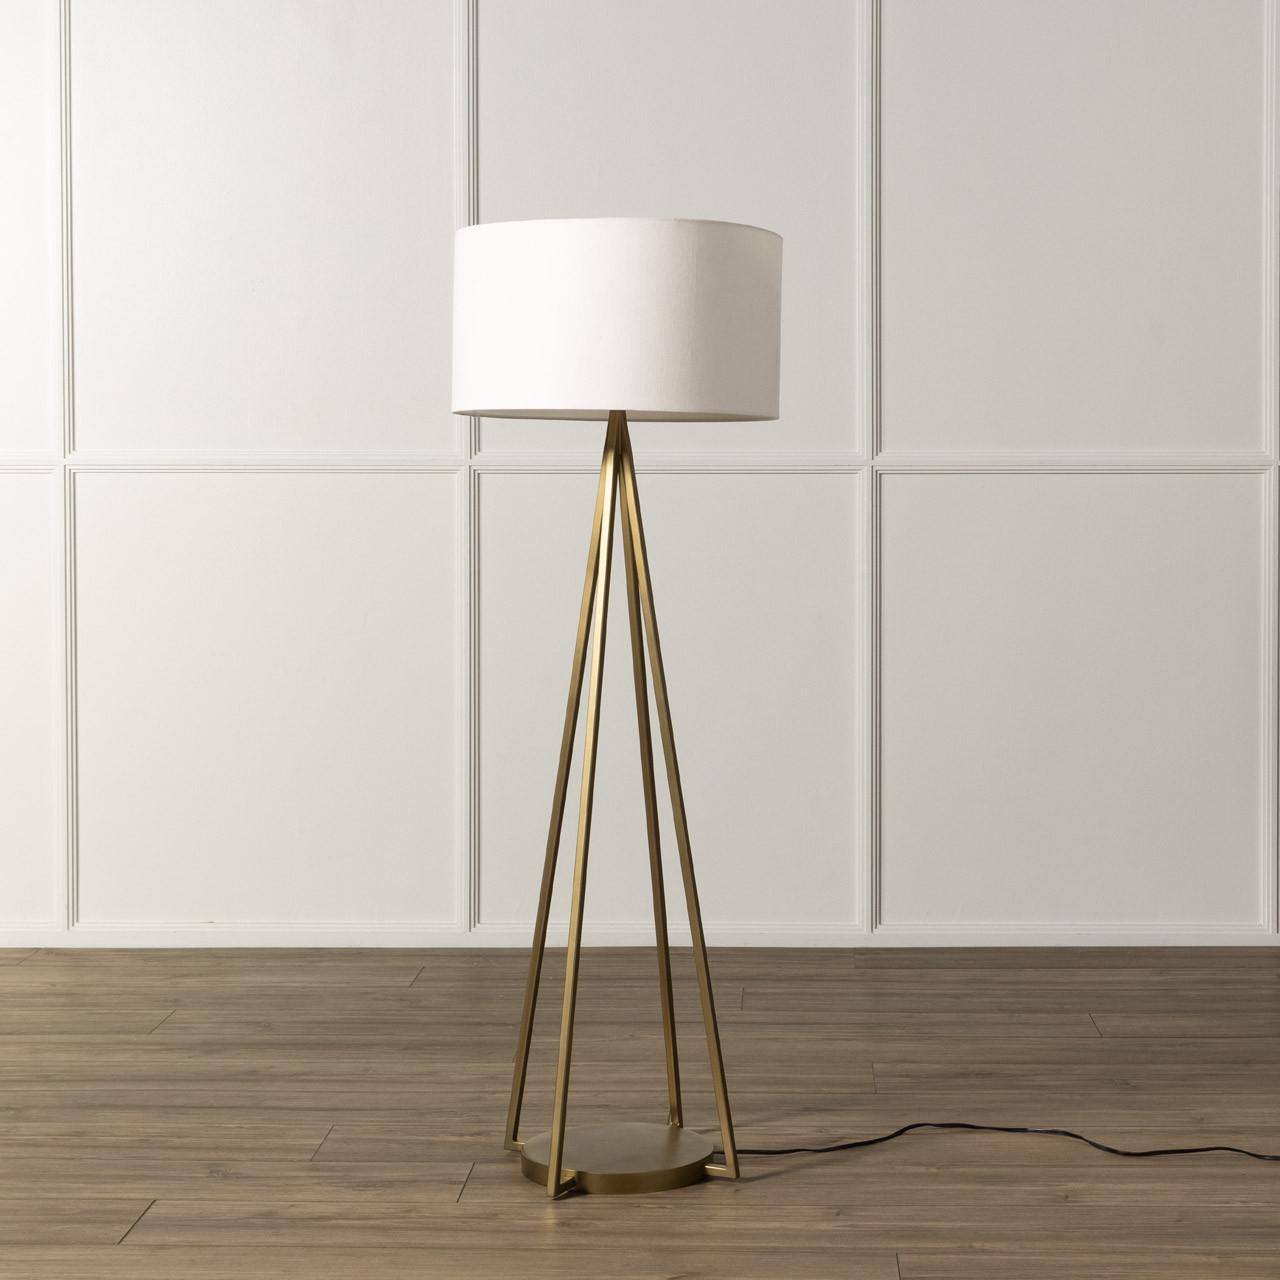 Wes Floor Lamp - Antique Brass